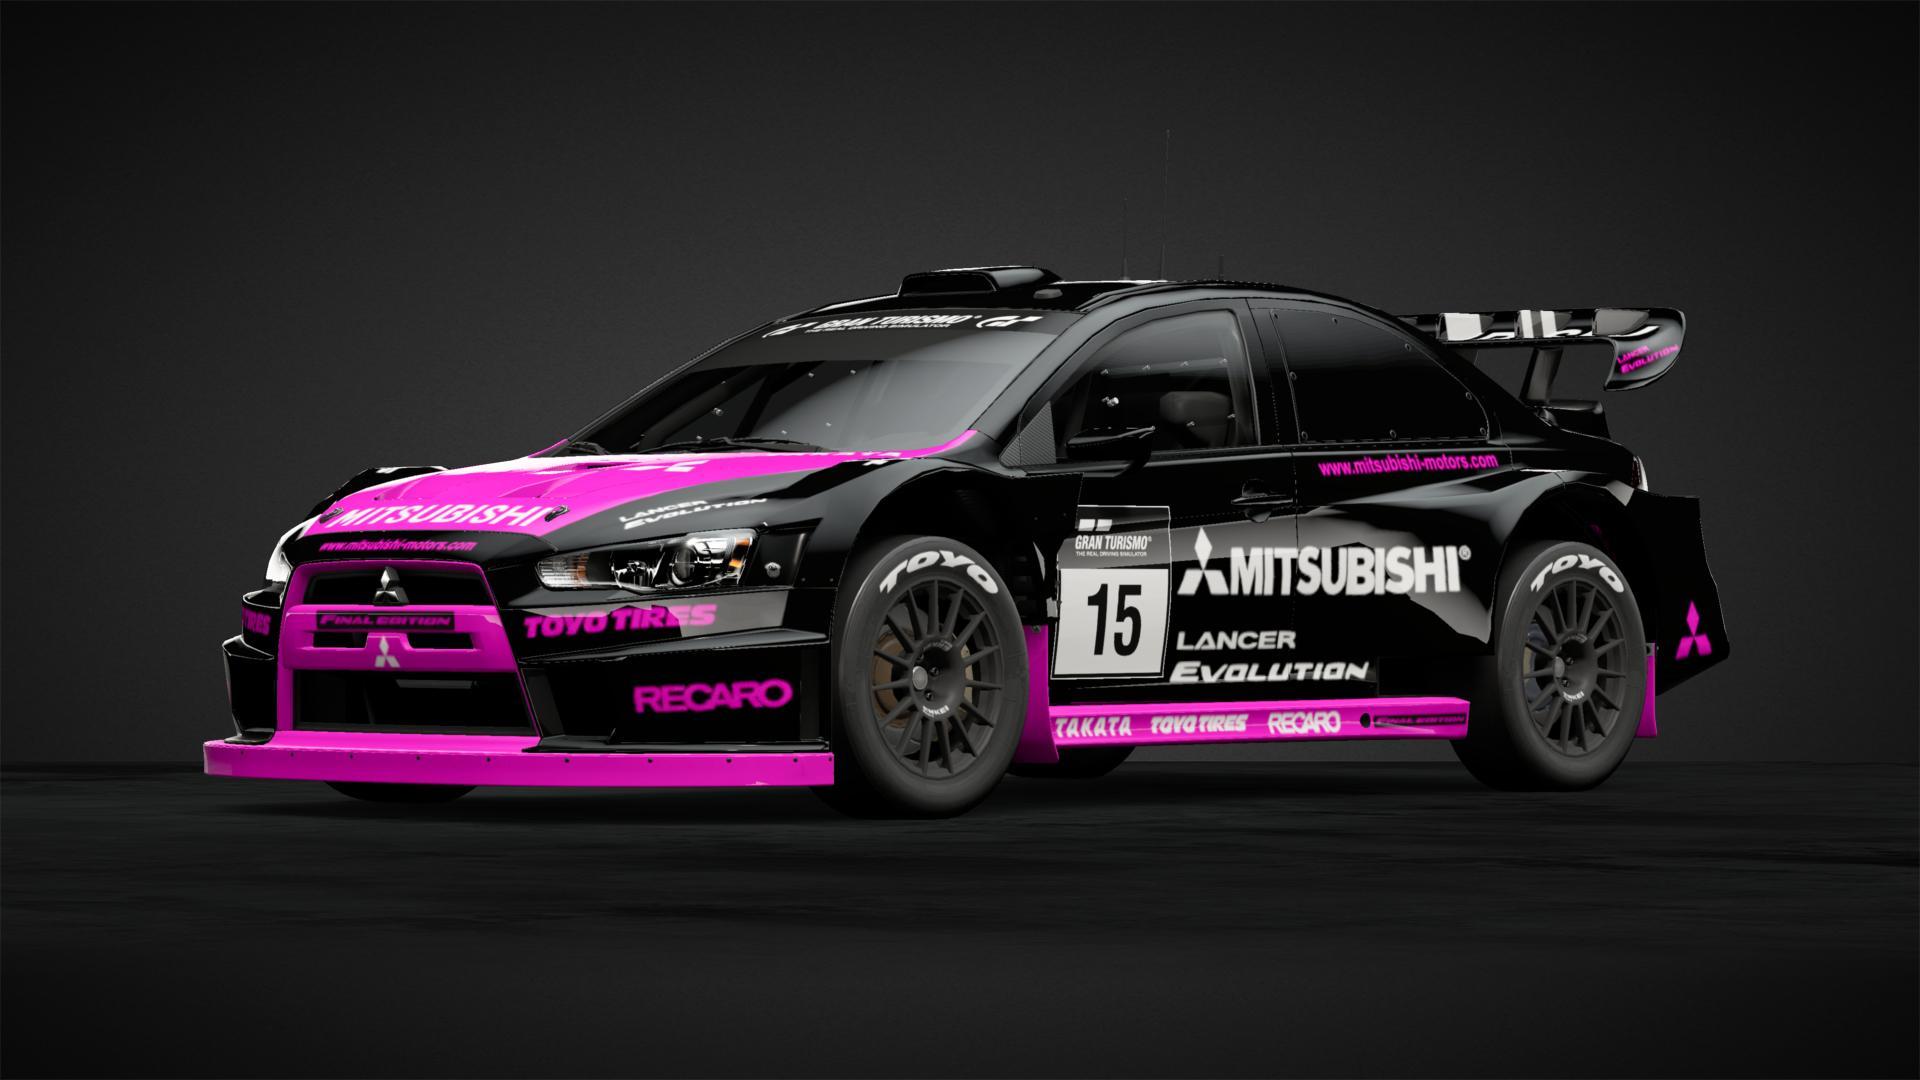 Mitsubishi Lancer Evolution Grb Car Livery By Ginjen15 Community